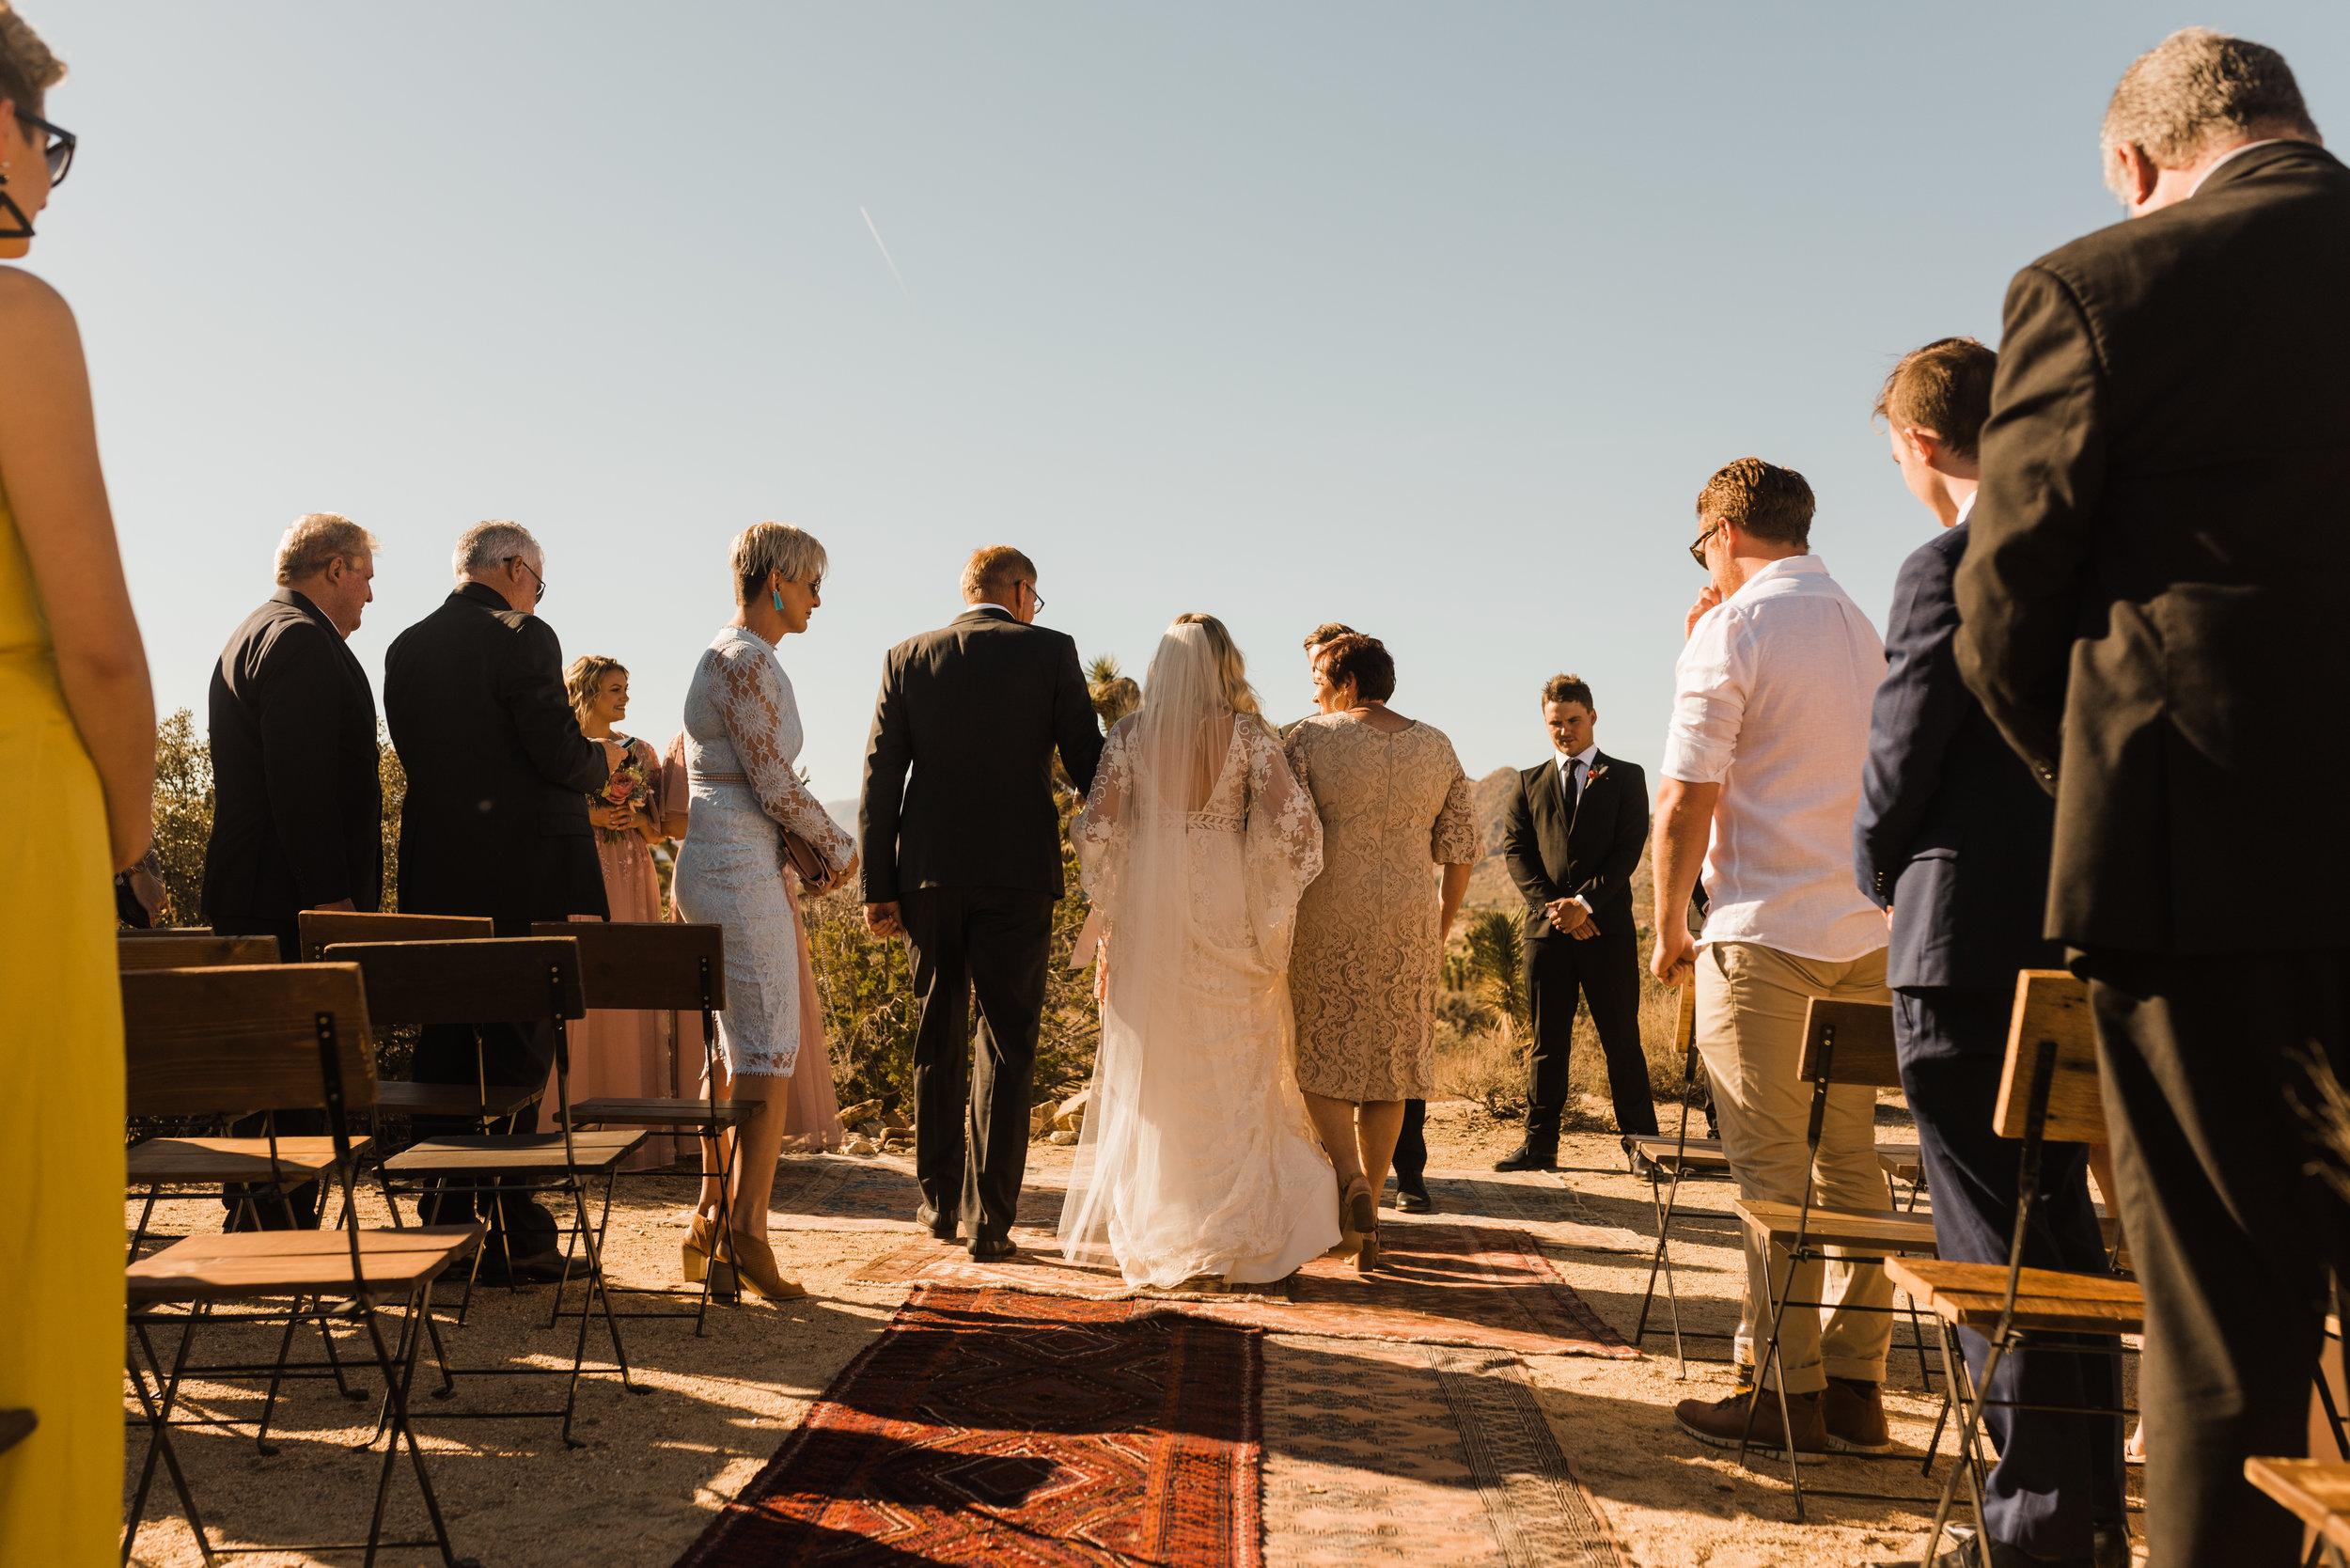 Boho Indie Intimate Wedding at Cactus Moon Retreat in Joshua Tree